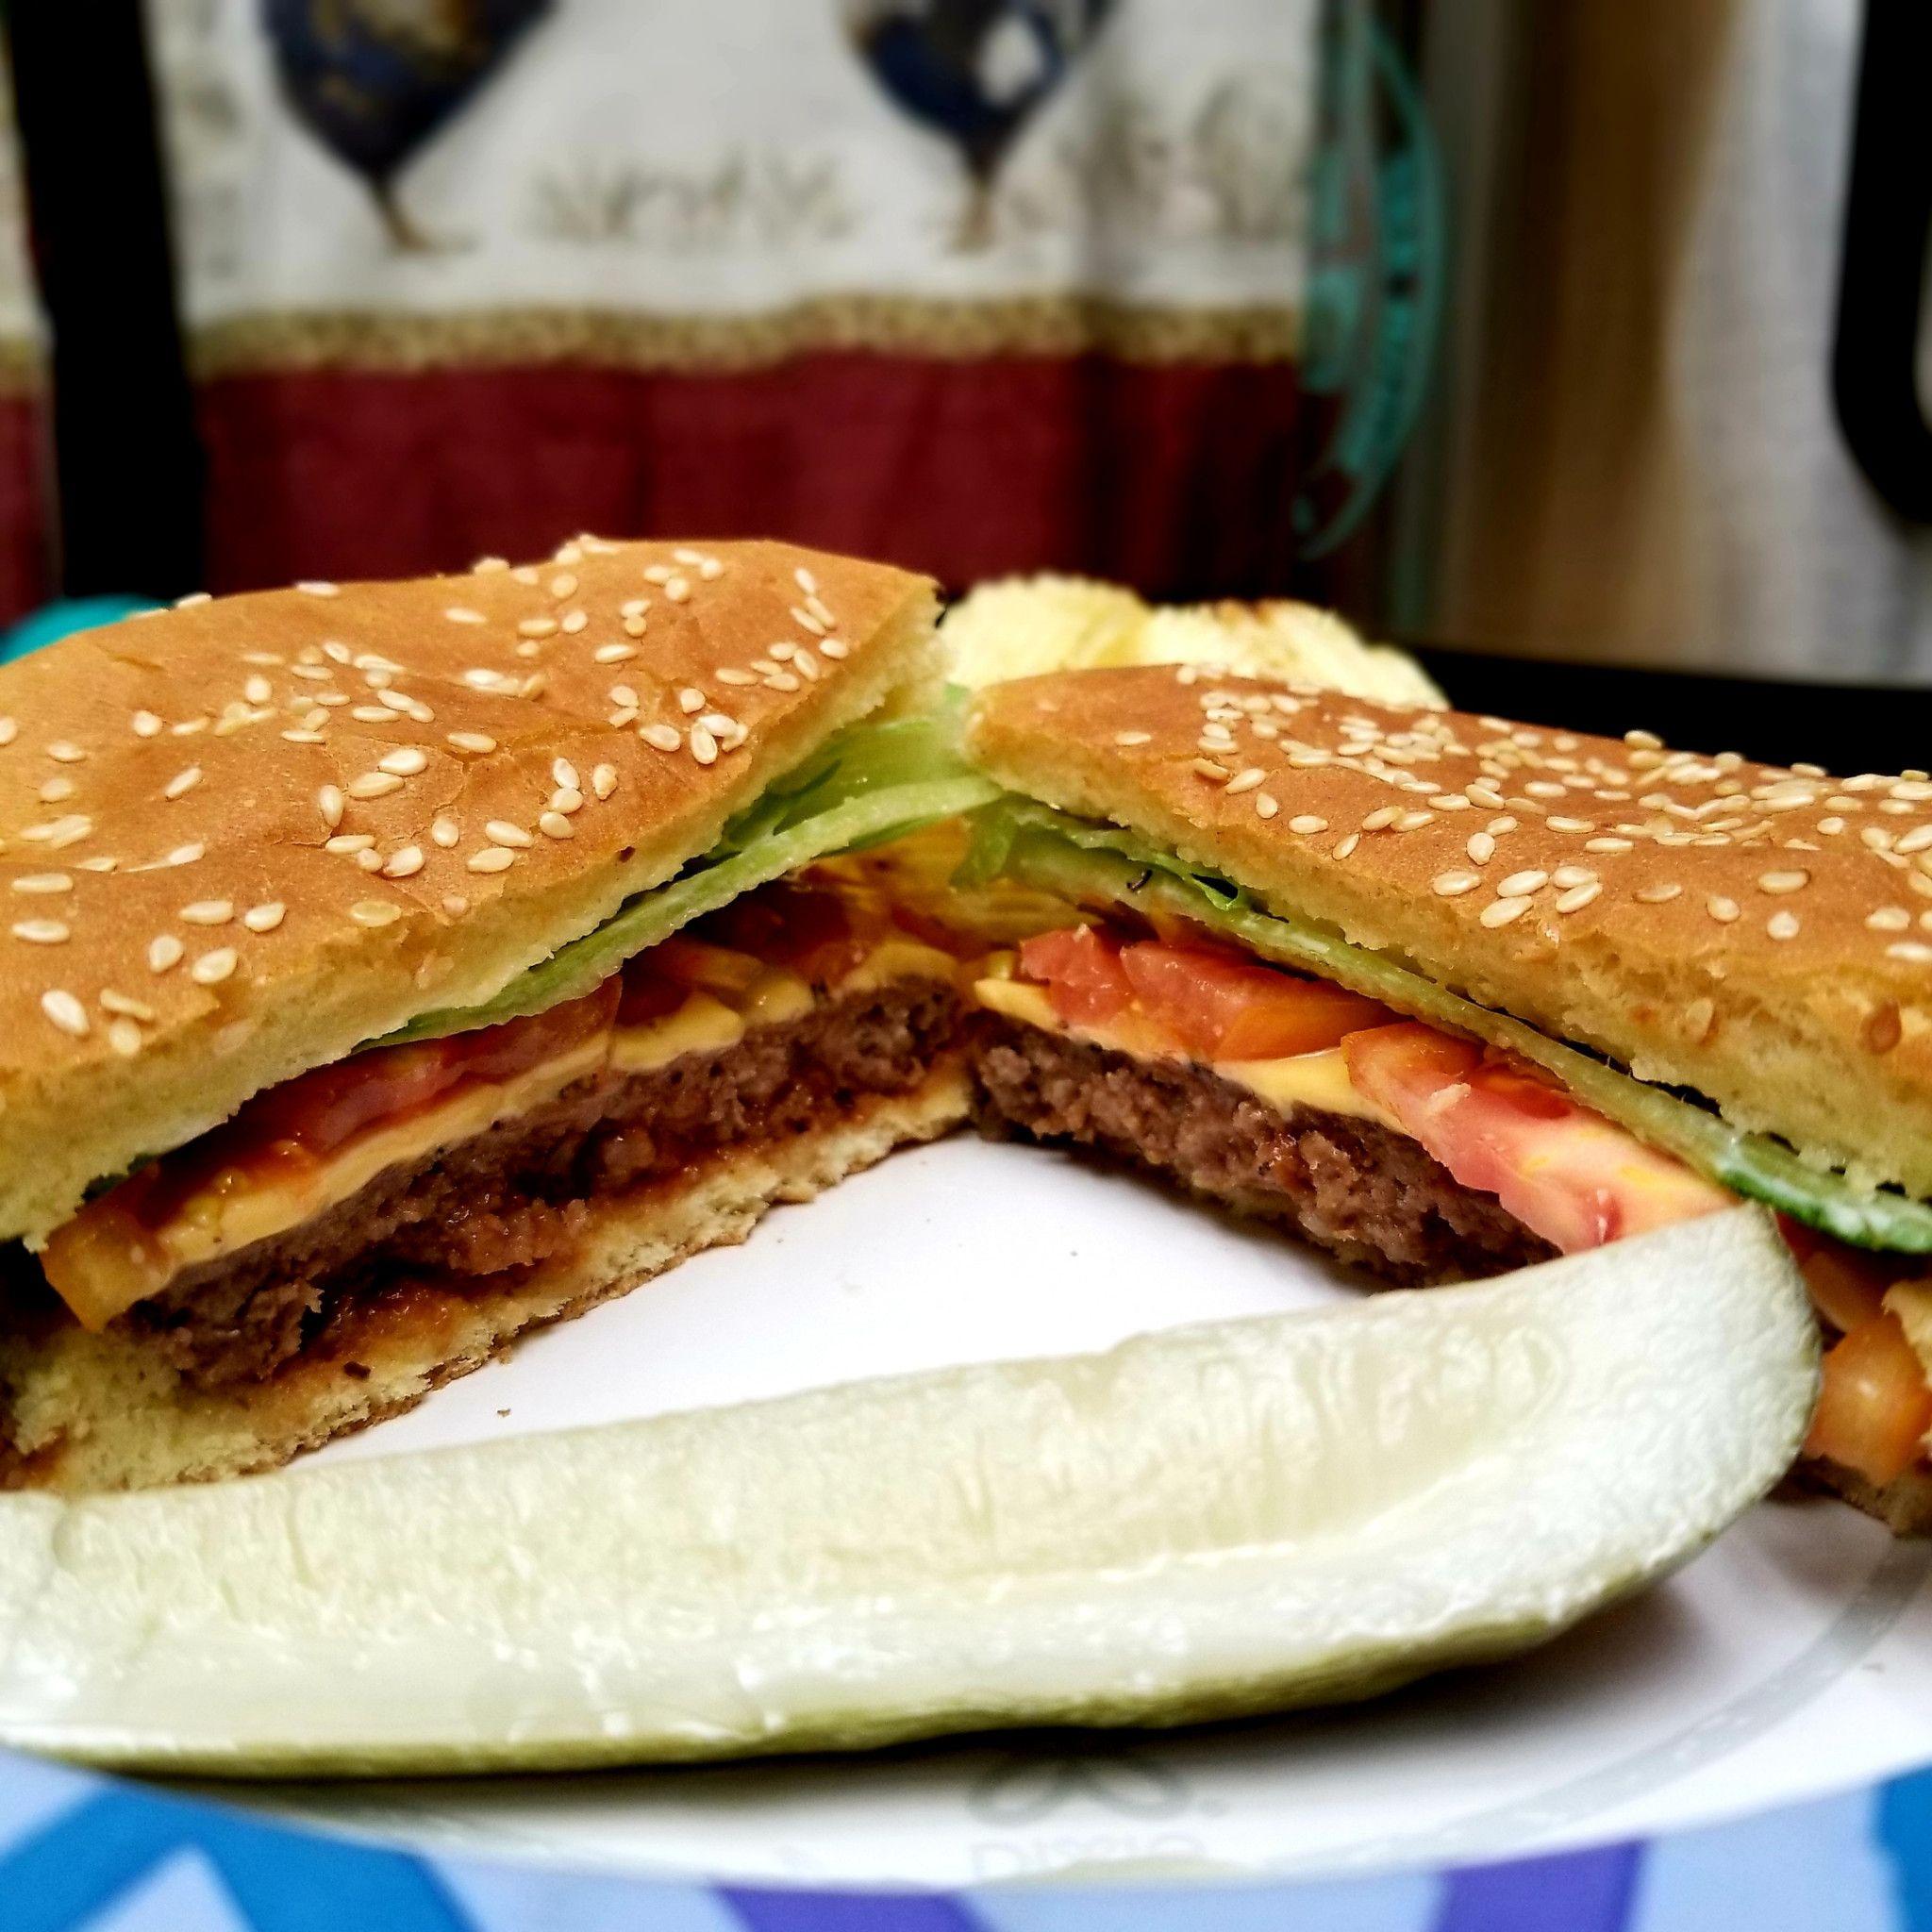 Instant Pot Frozen Hamburgers in 2020   Burgers on the ...